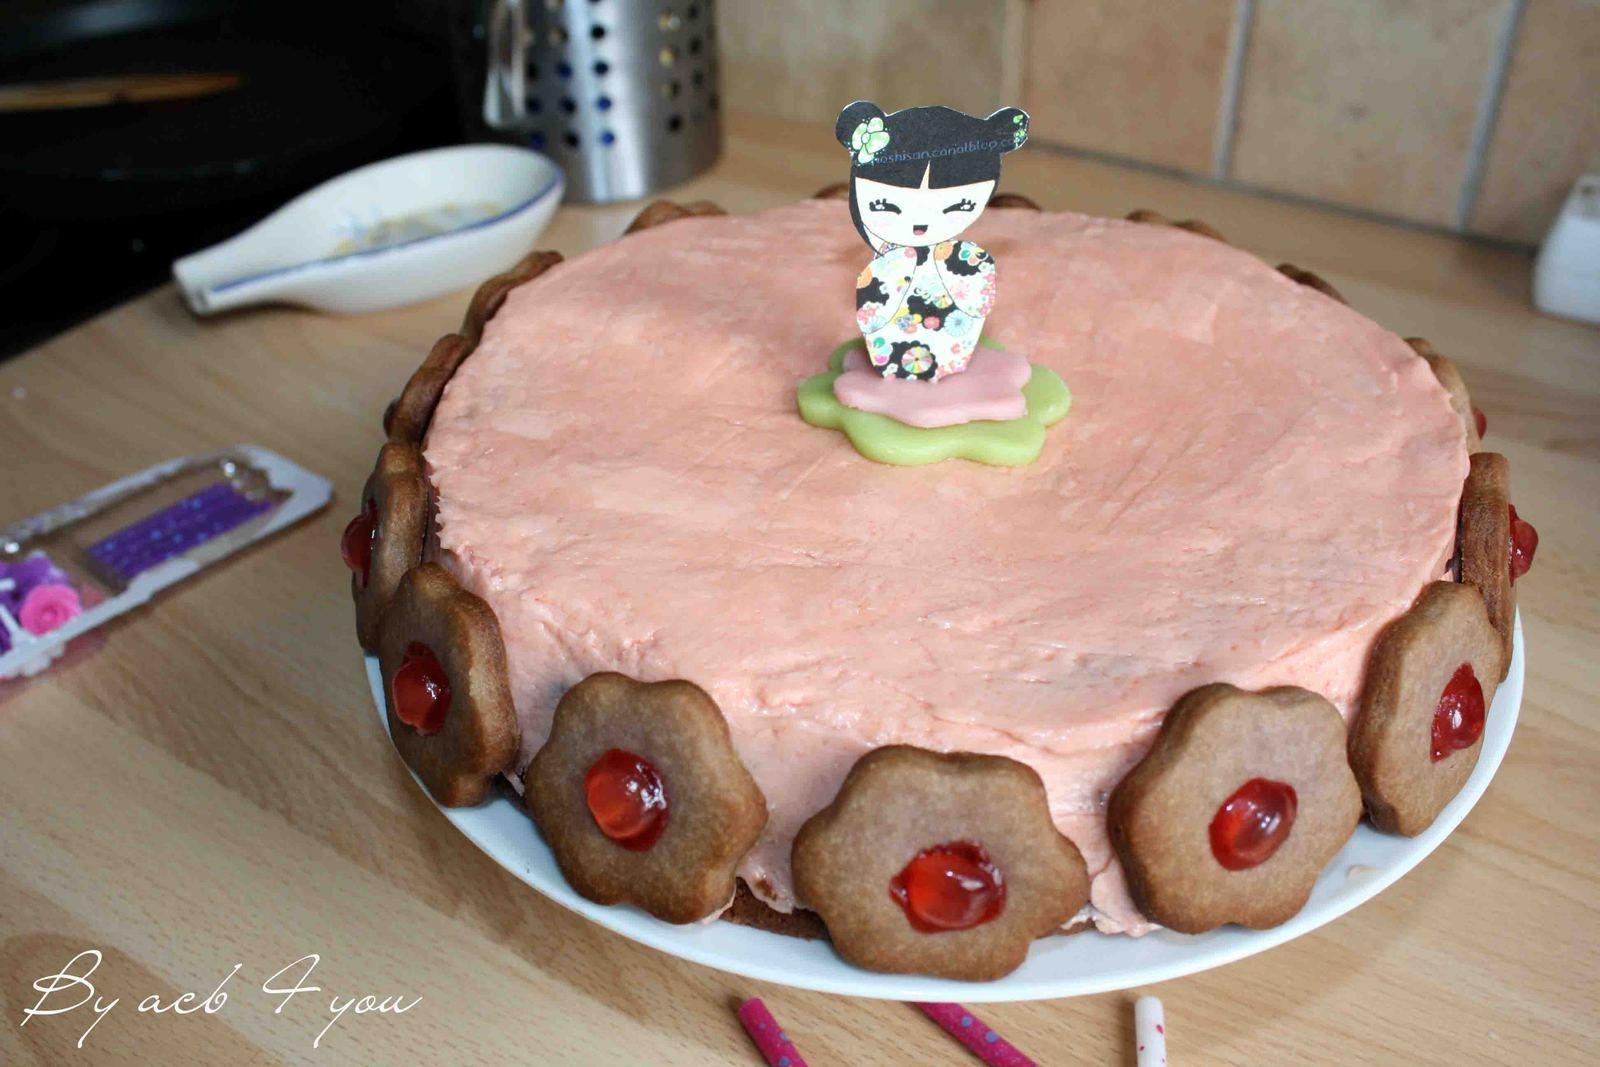 Girly cake au sirop de fraises